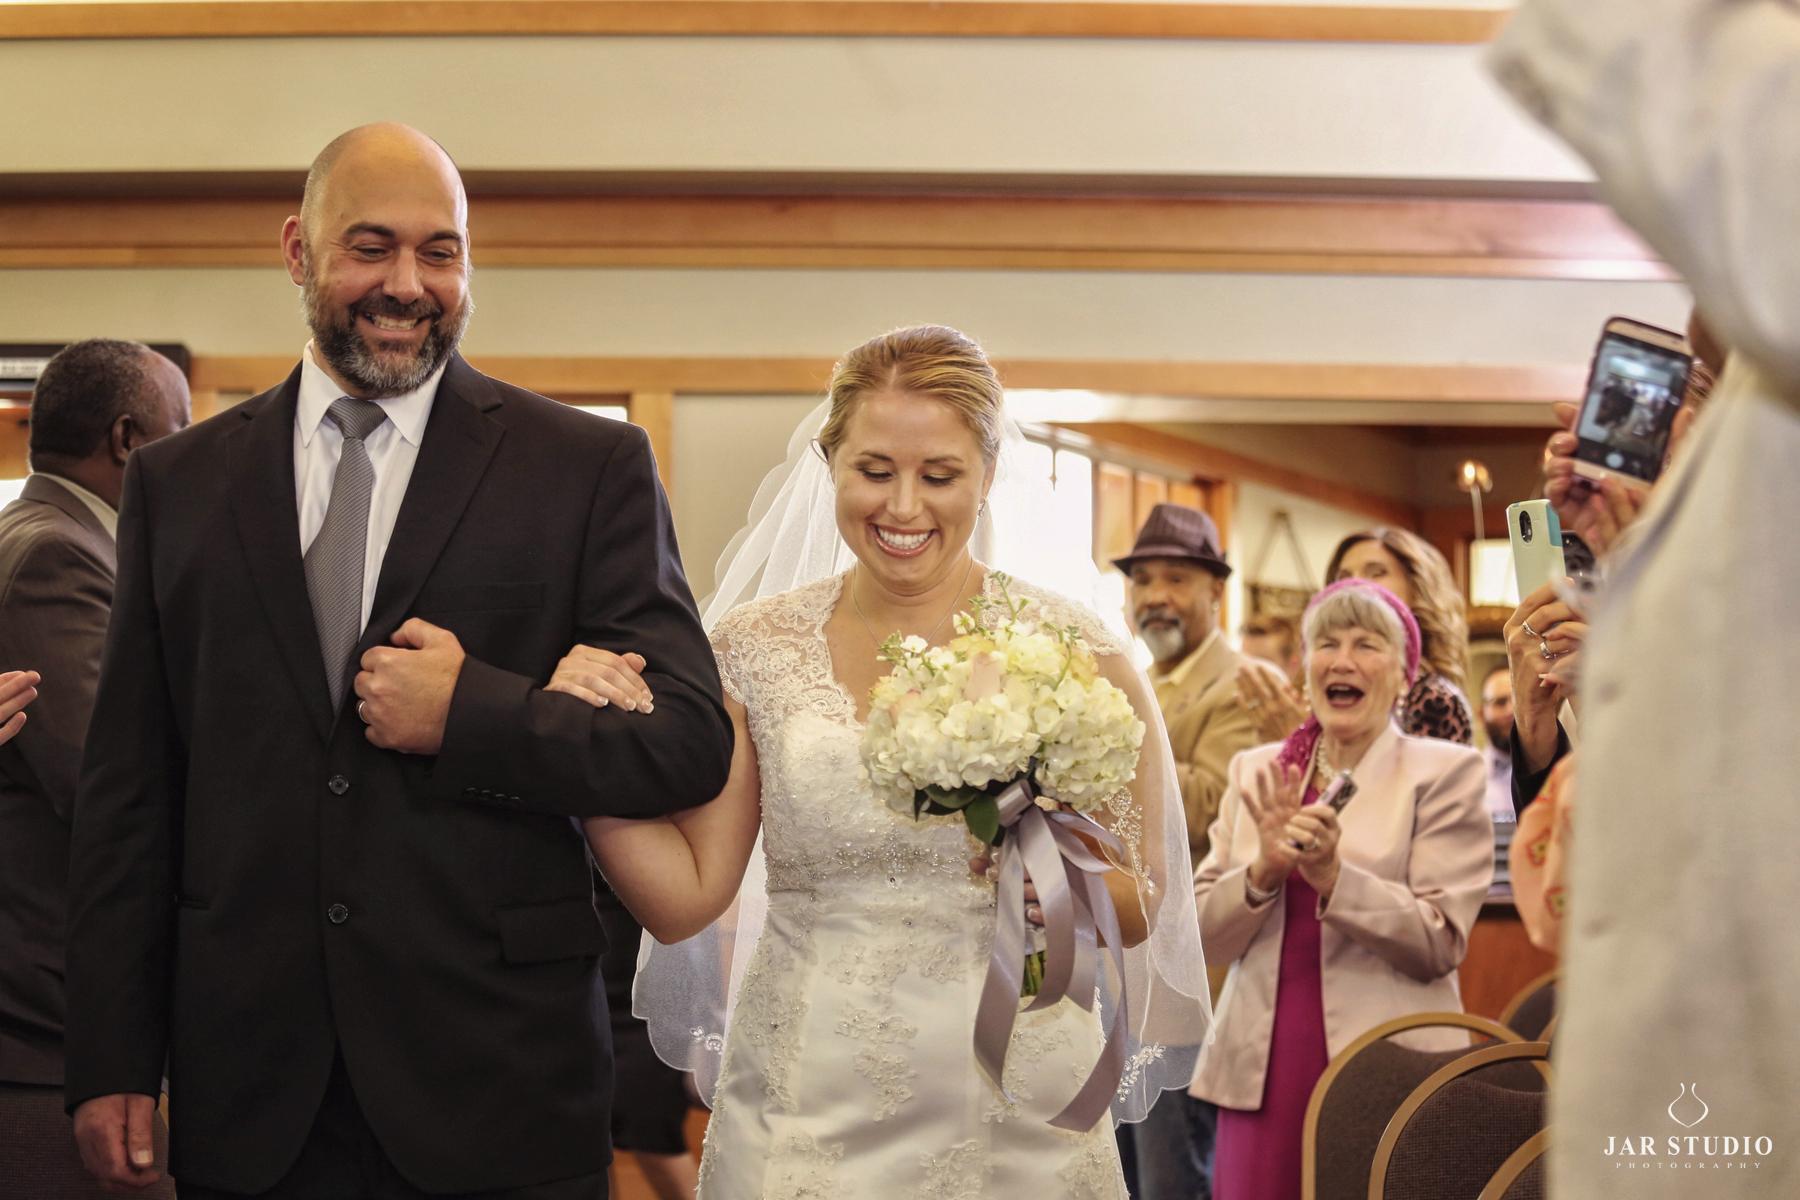 14-here-comes-the-bride-moment-jarstudio.jpg